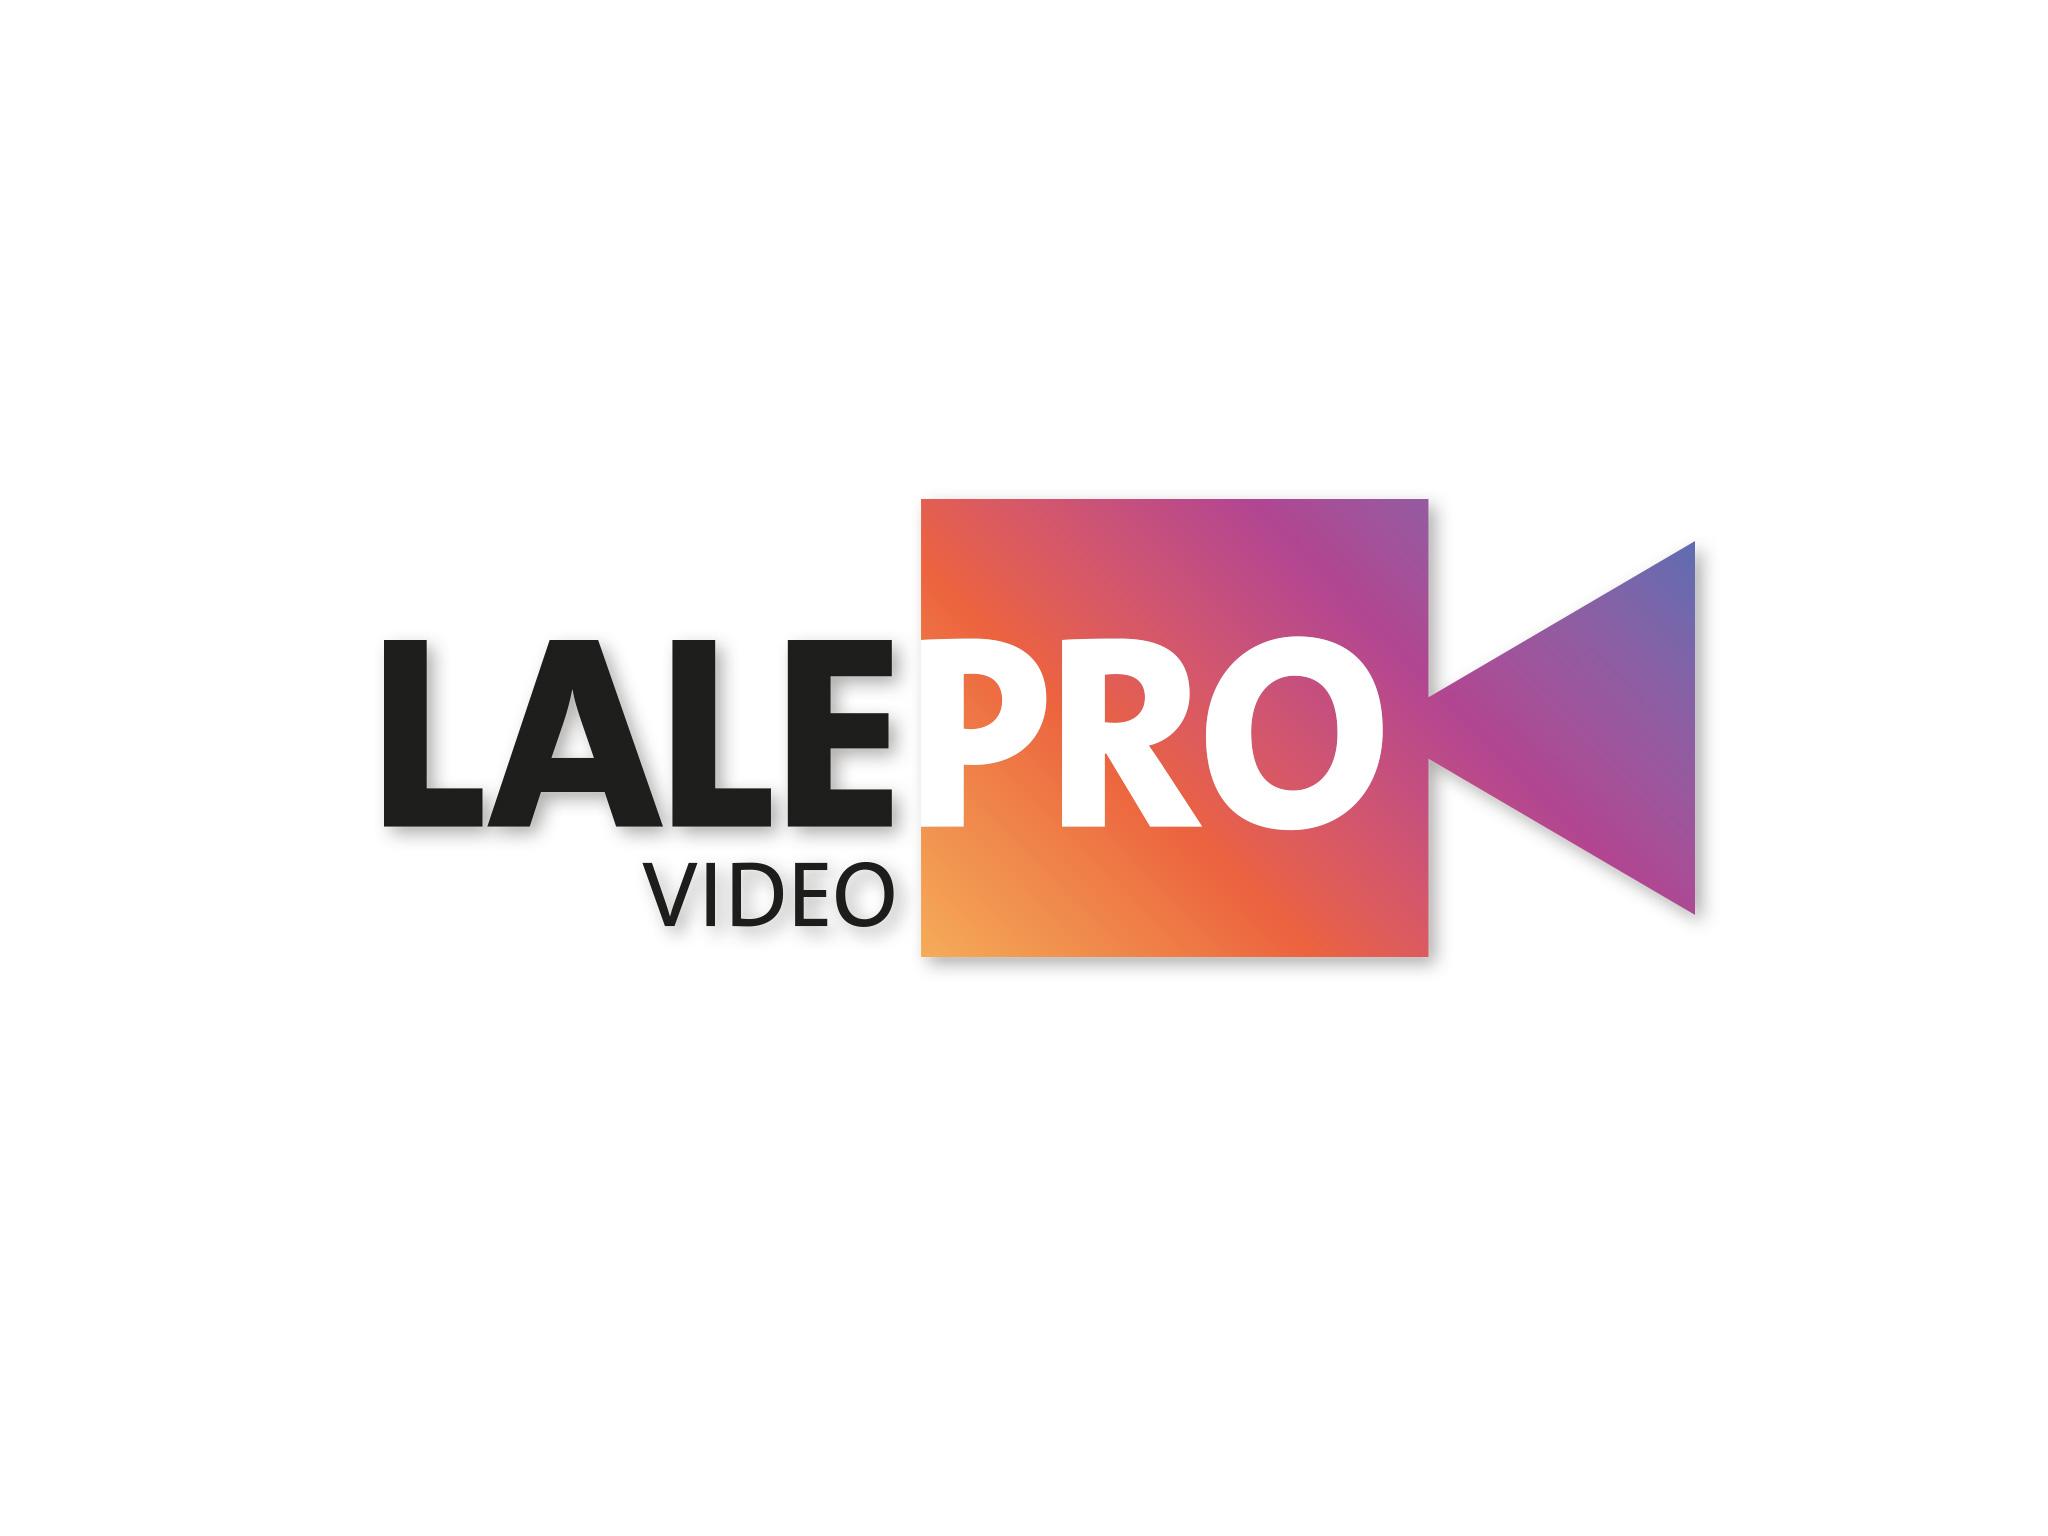 Lalepro video Amsterdam